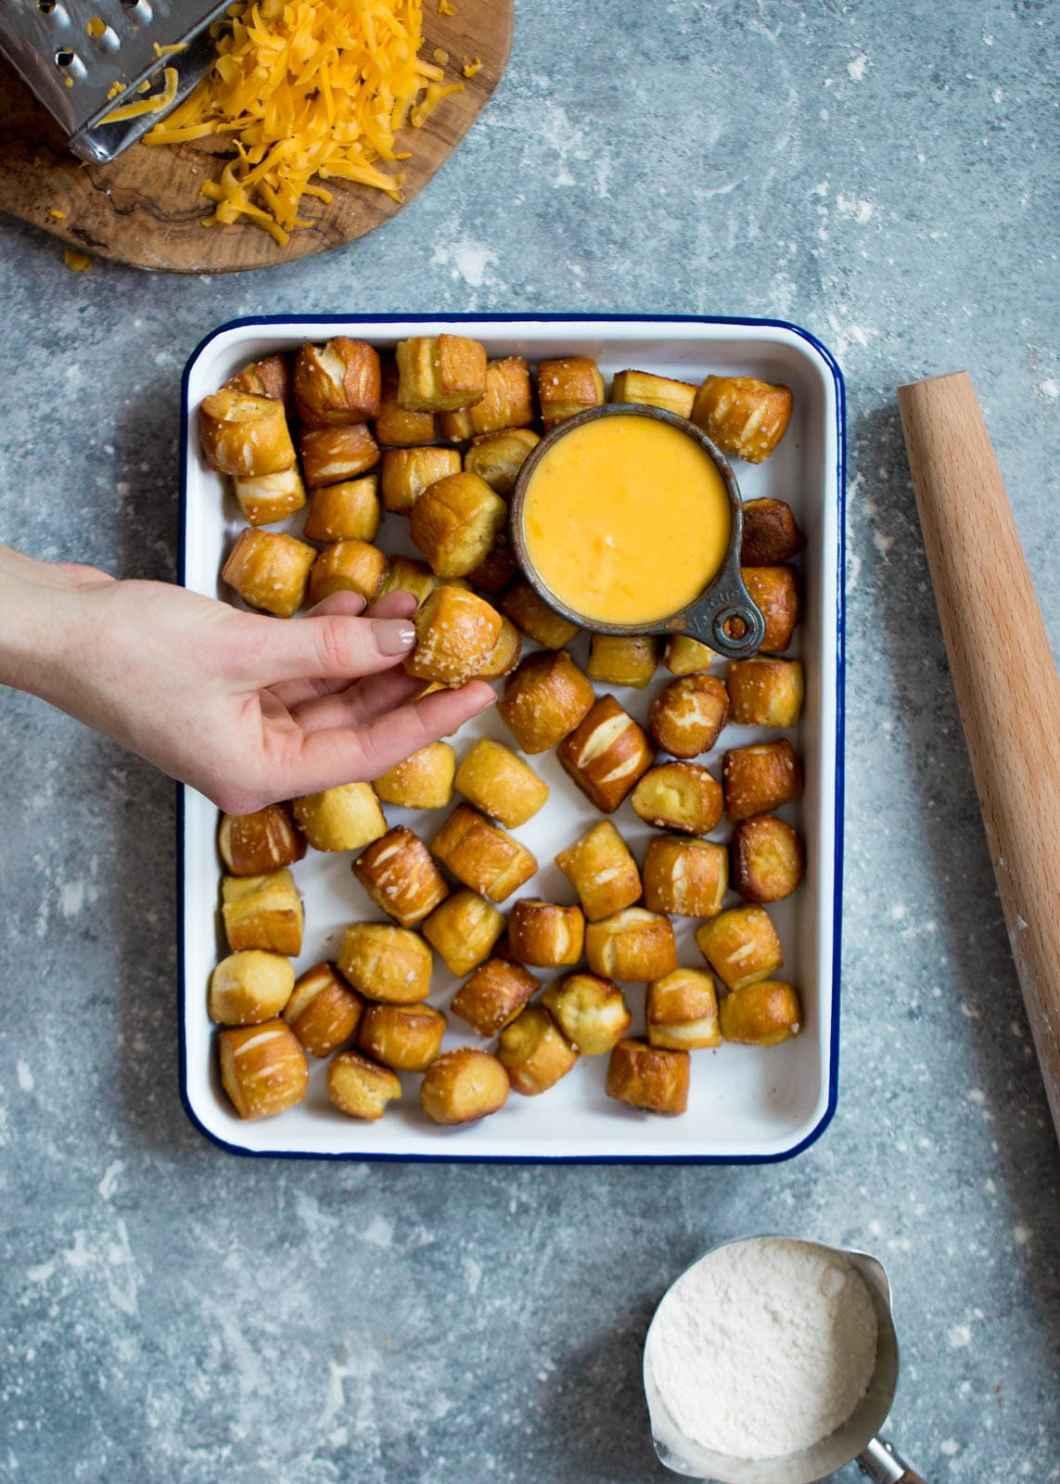 Pretzelmaker Pretzel Bites Recipe | Dandk Organizer